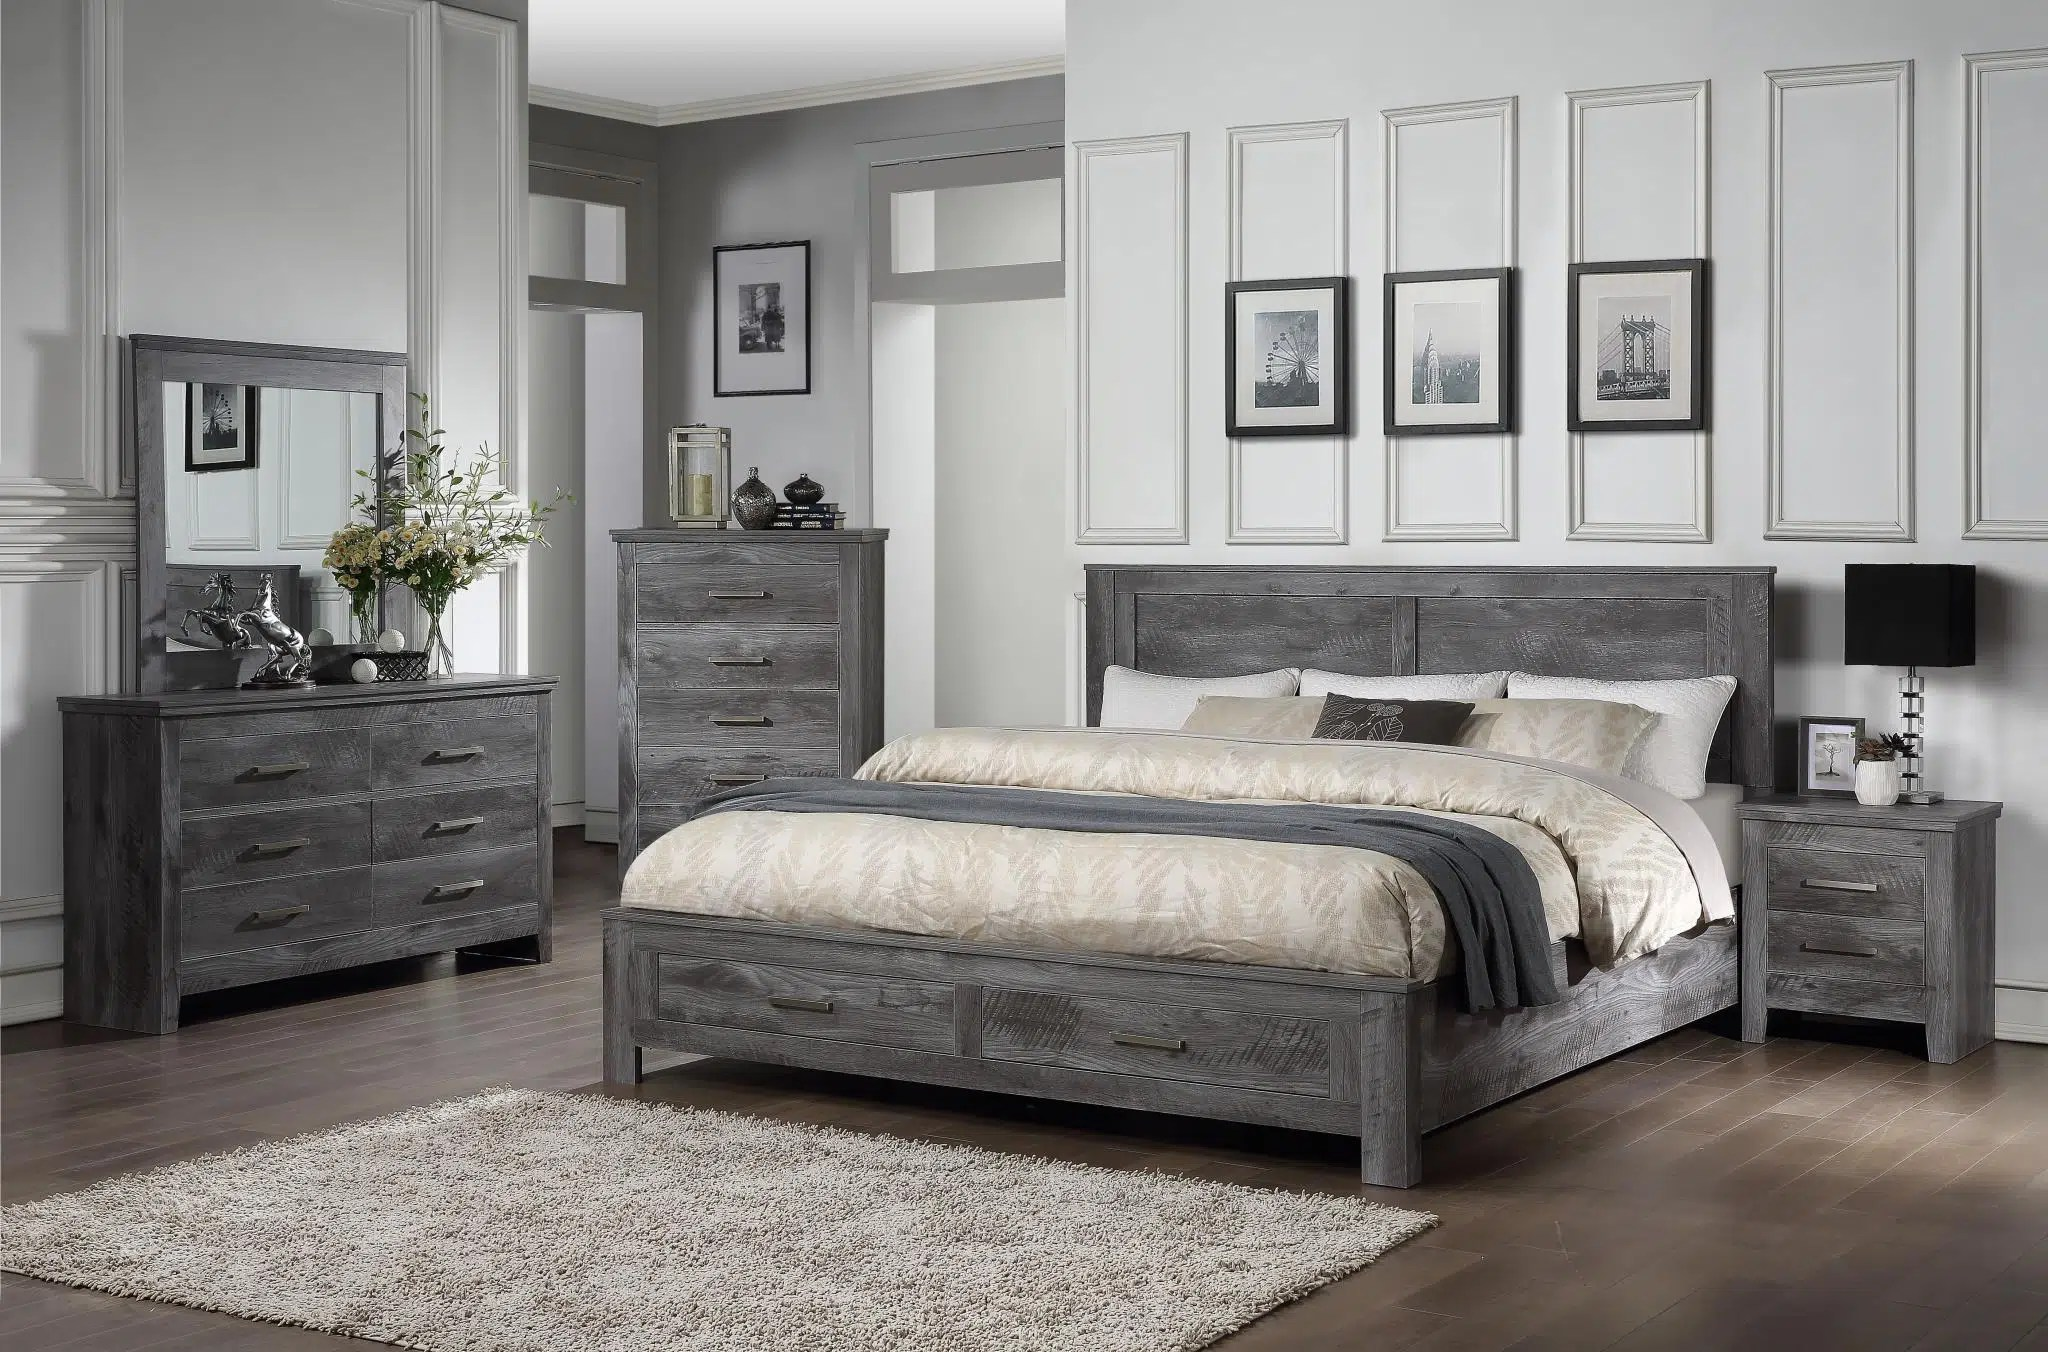 vidalia storage rustic gray oak bedroom set